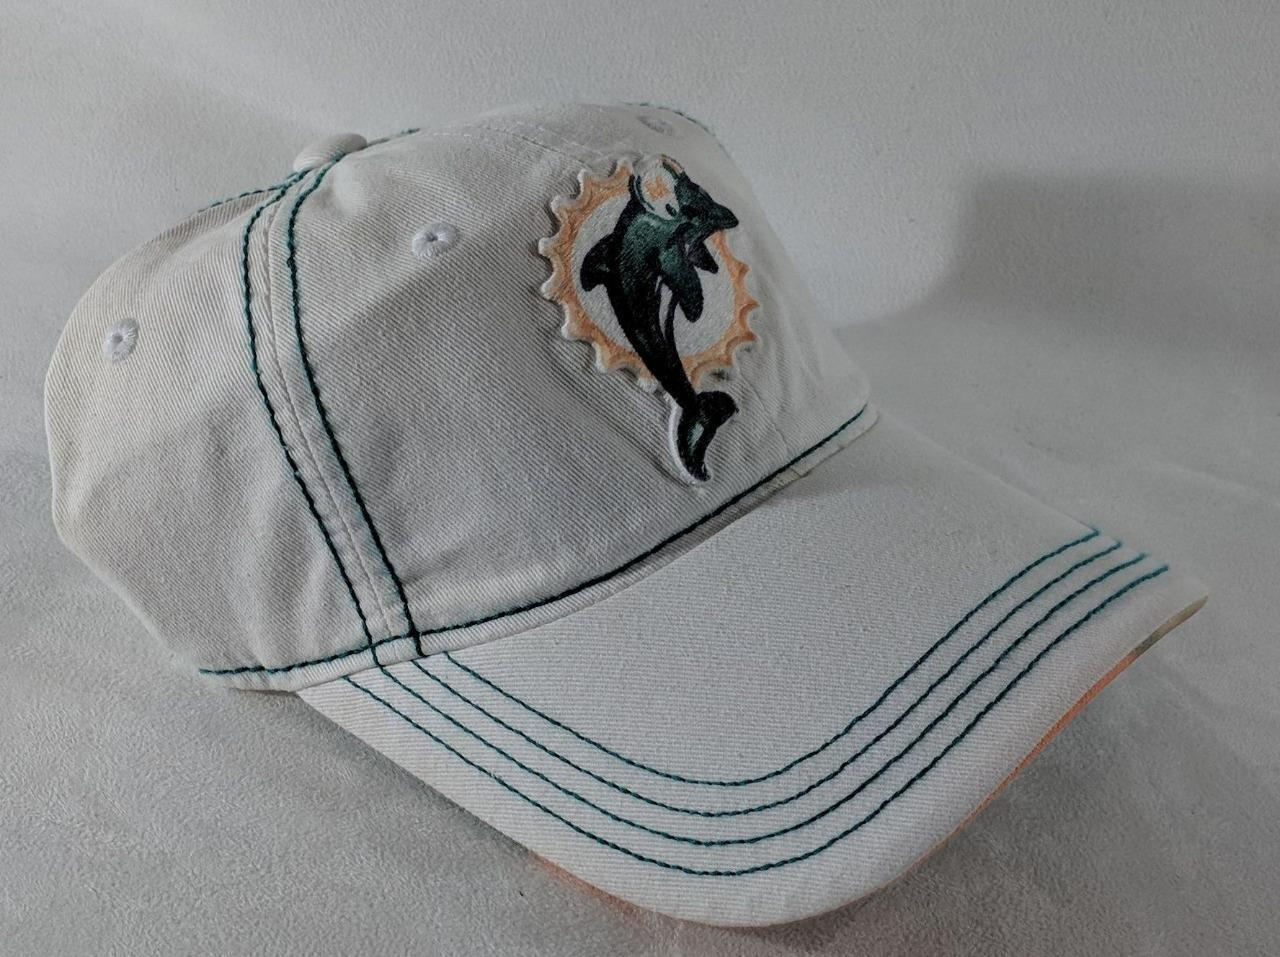 LZ NFL Team Apparel Adult One Size OSFA Miami Dolphins Baseball Hat Cap NEW i35